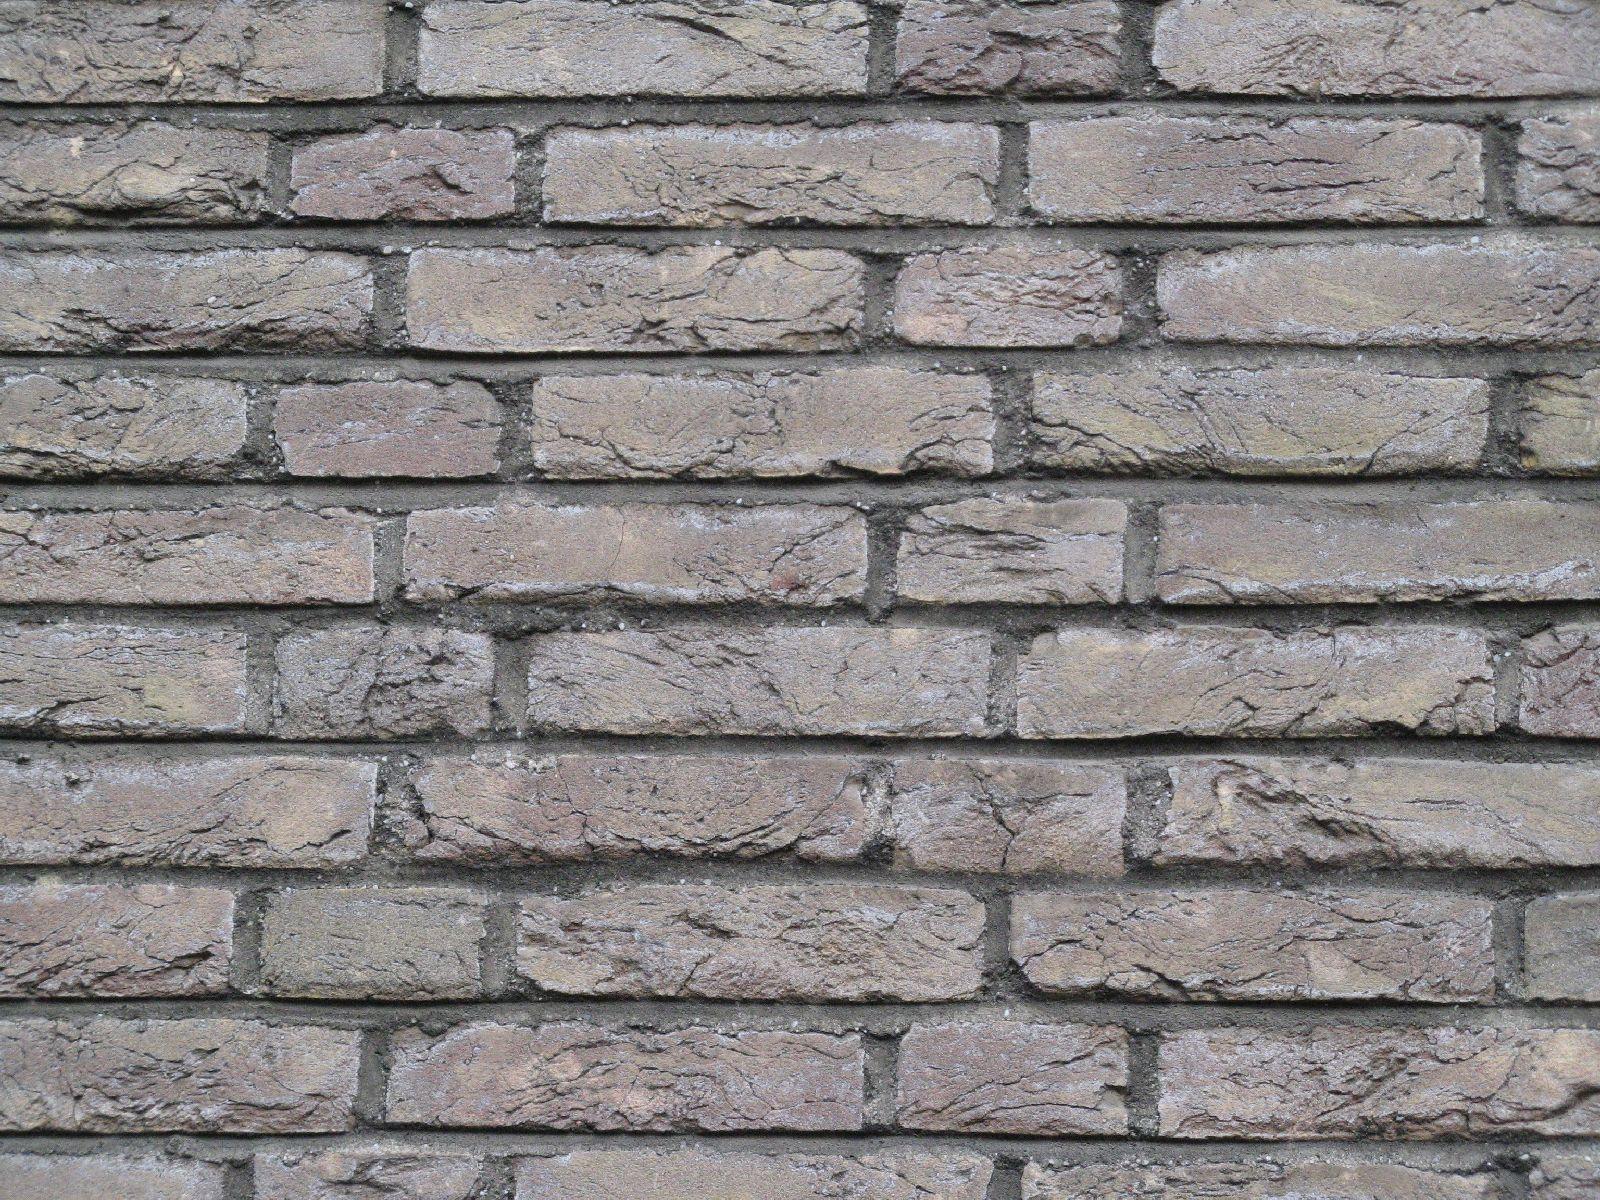 Brick_Texture_B_0516